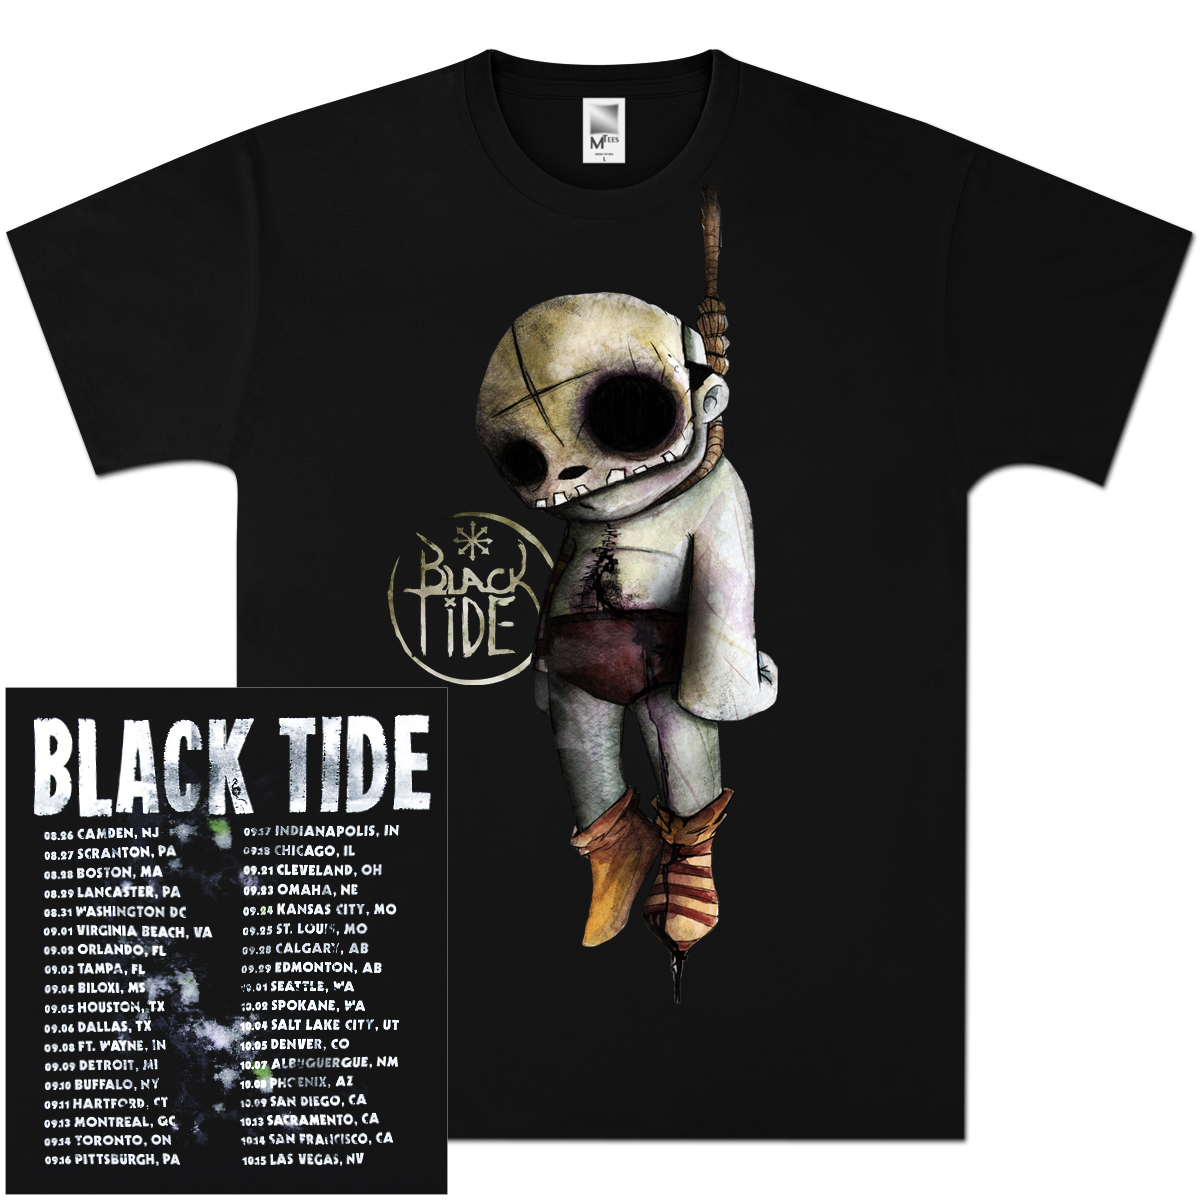 Black Tide Post Mortem 2011 Tour T-Shirt